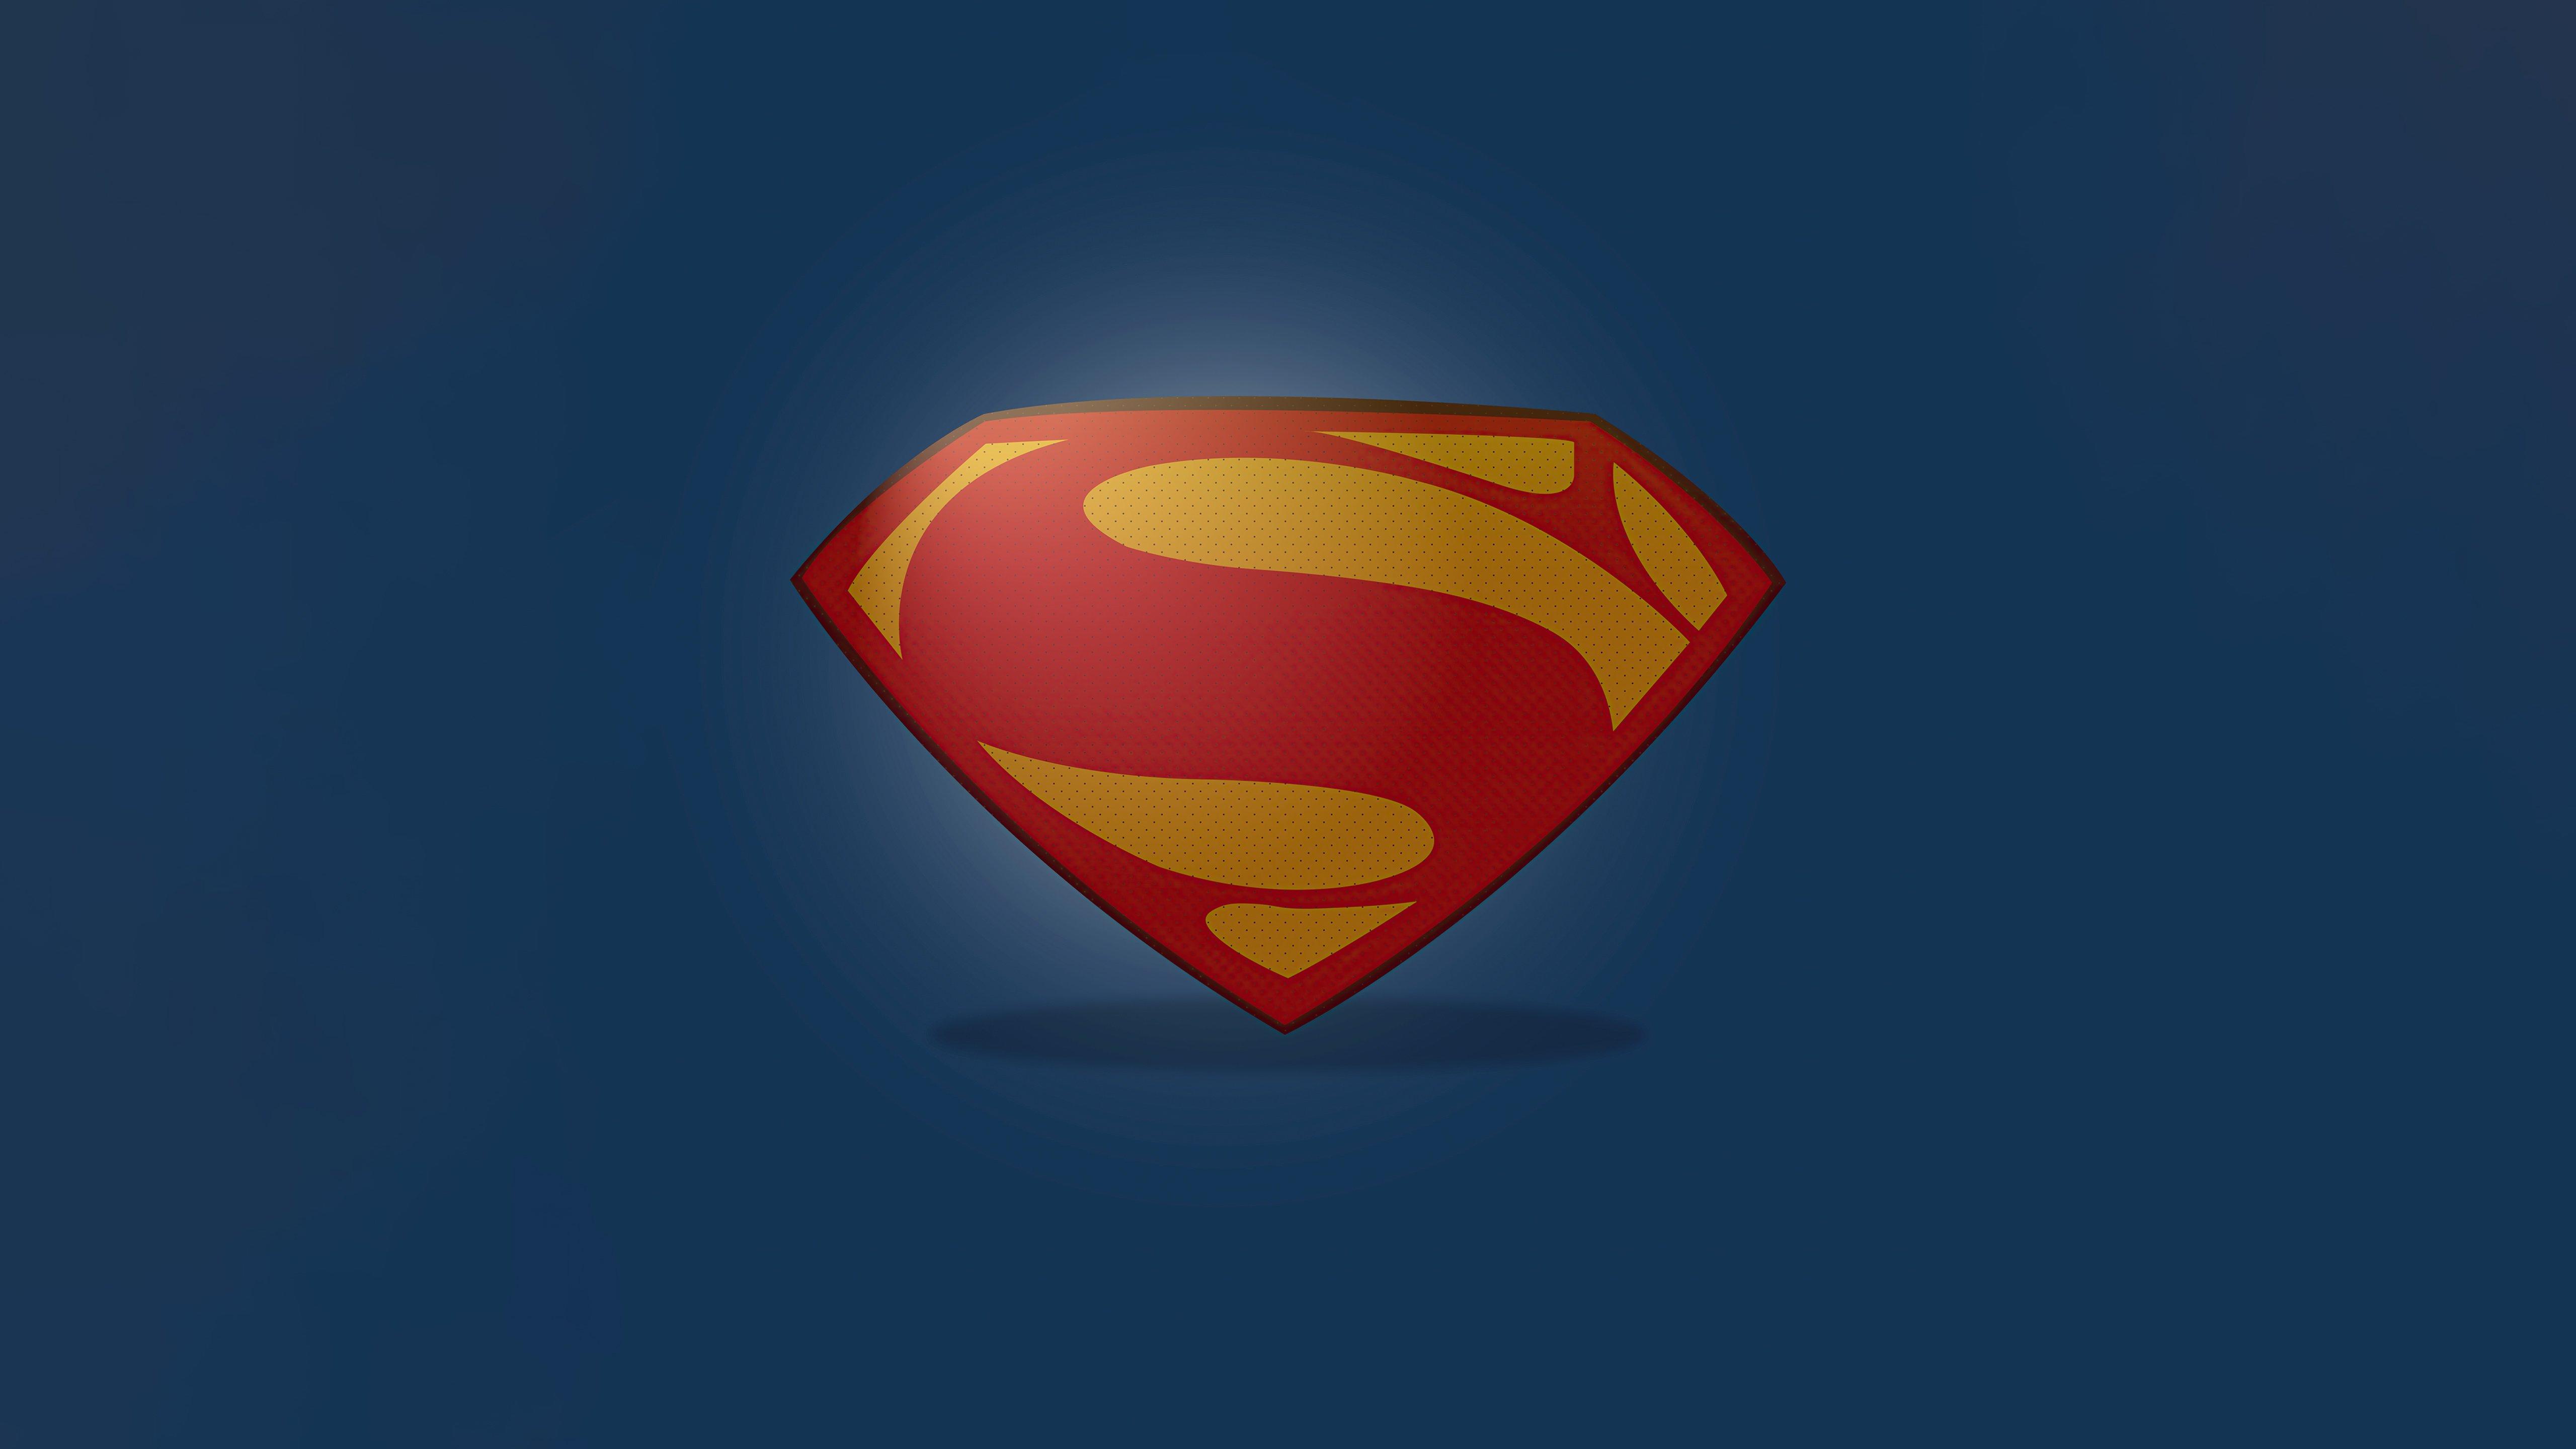 Fondos de pantalla Logo de Superman Minimalista